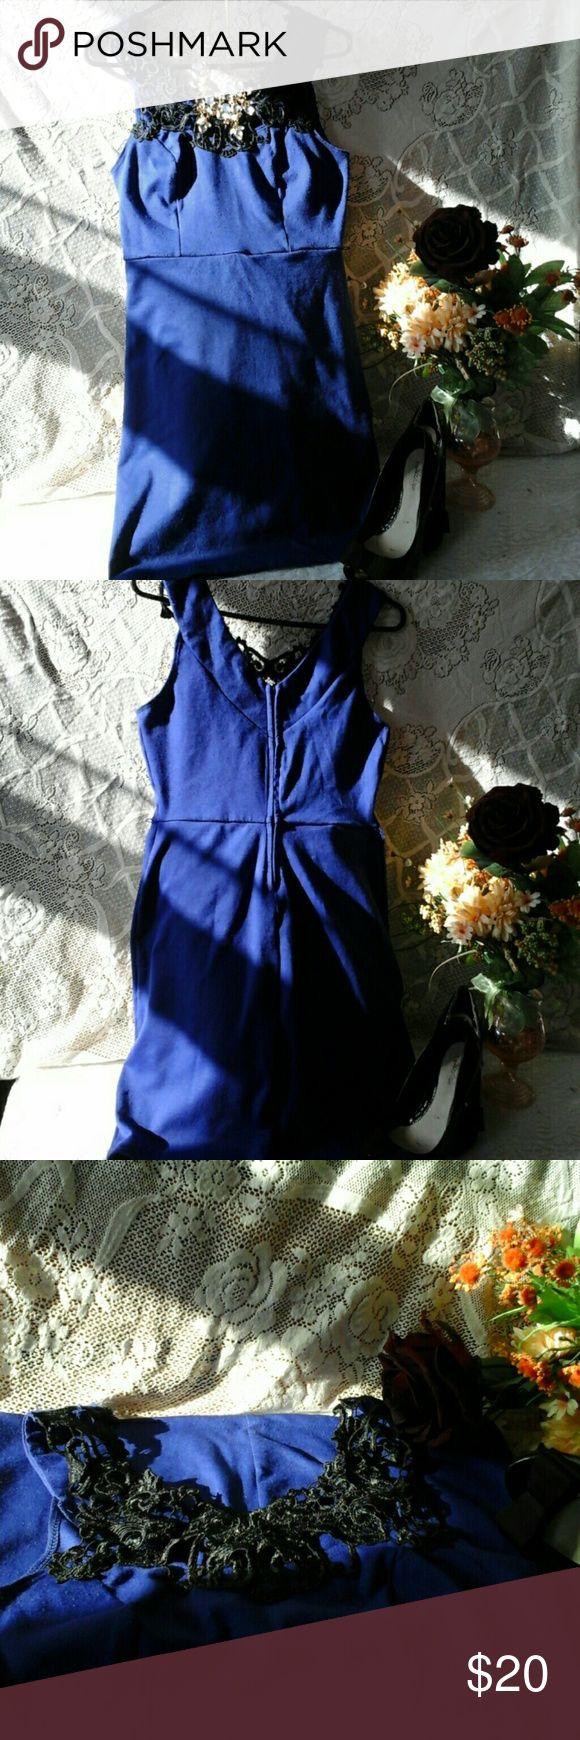 Cute blue dress! Good condition,  89% polyester,  7% rayon, 4% spandex, Junior size. As U Wish Dresses Mini